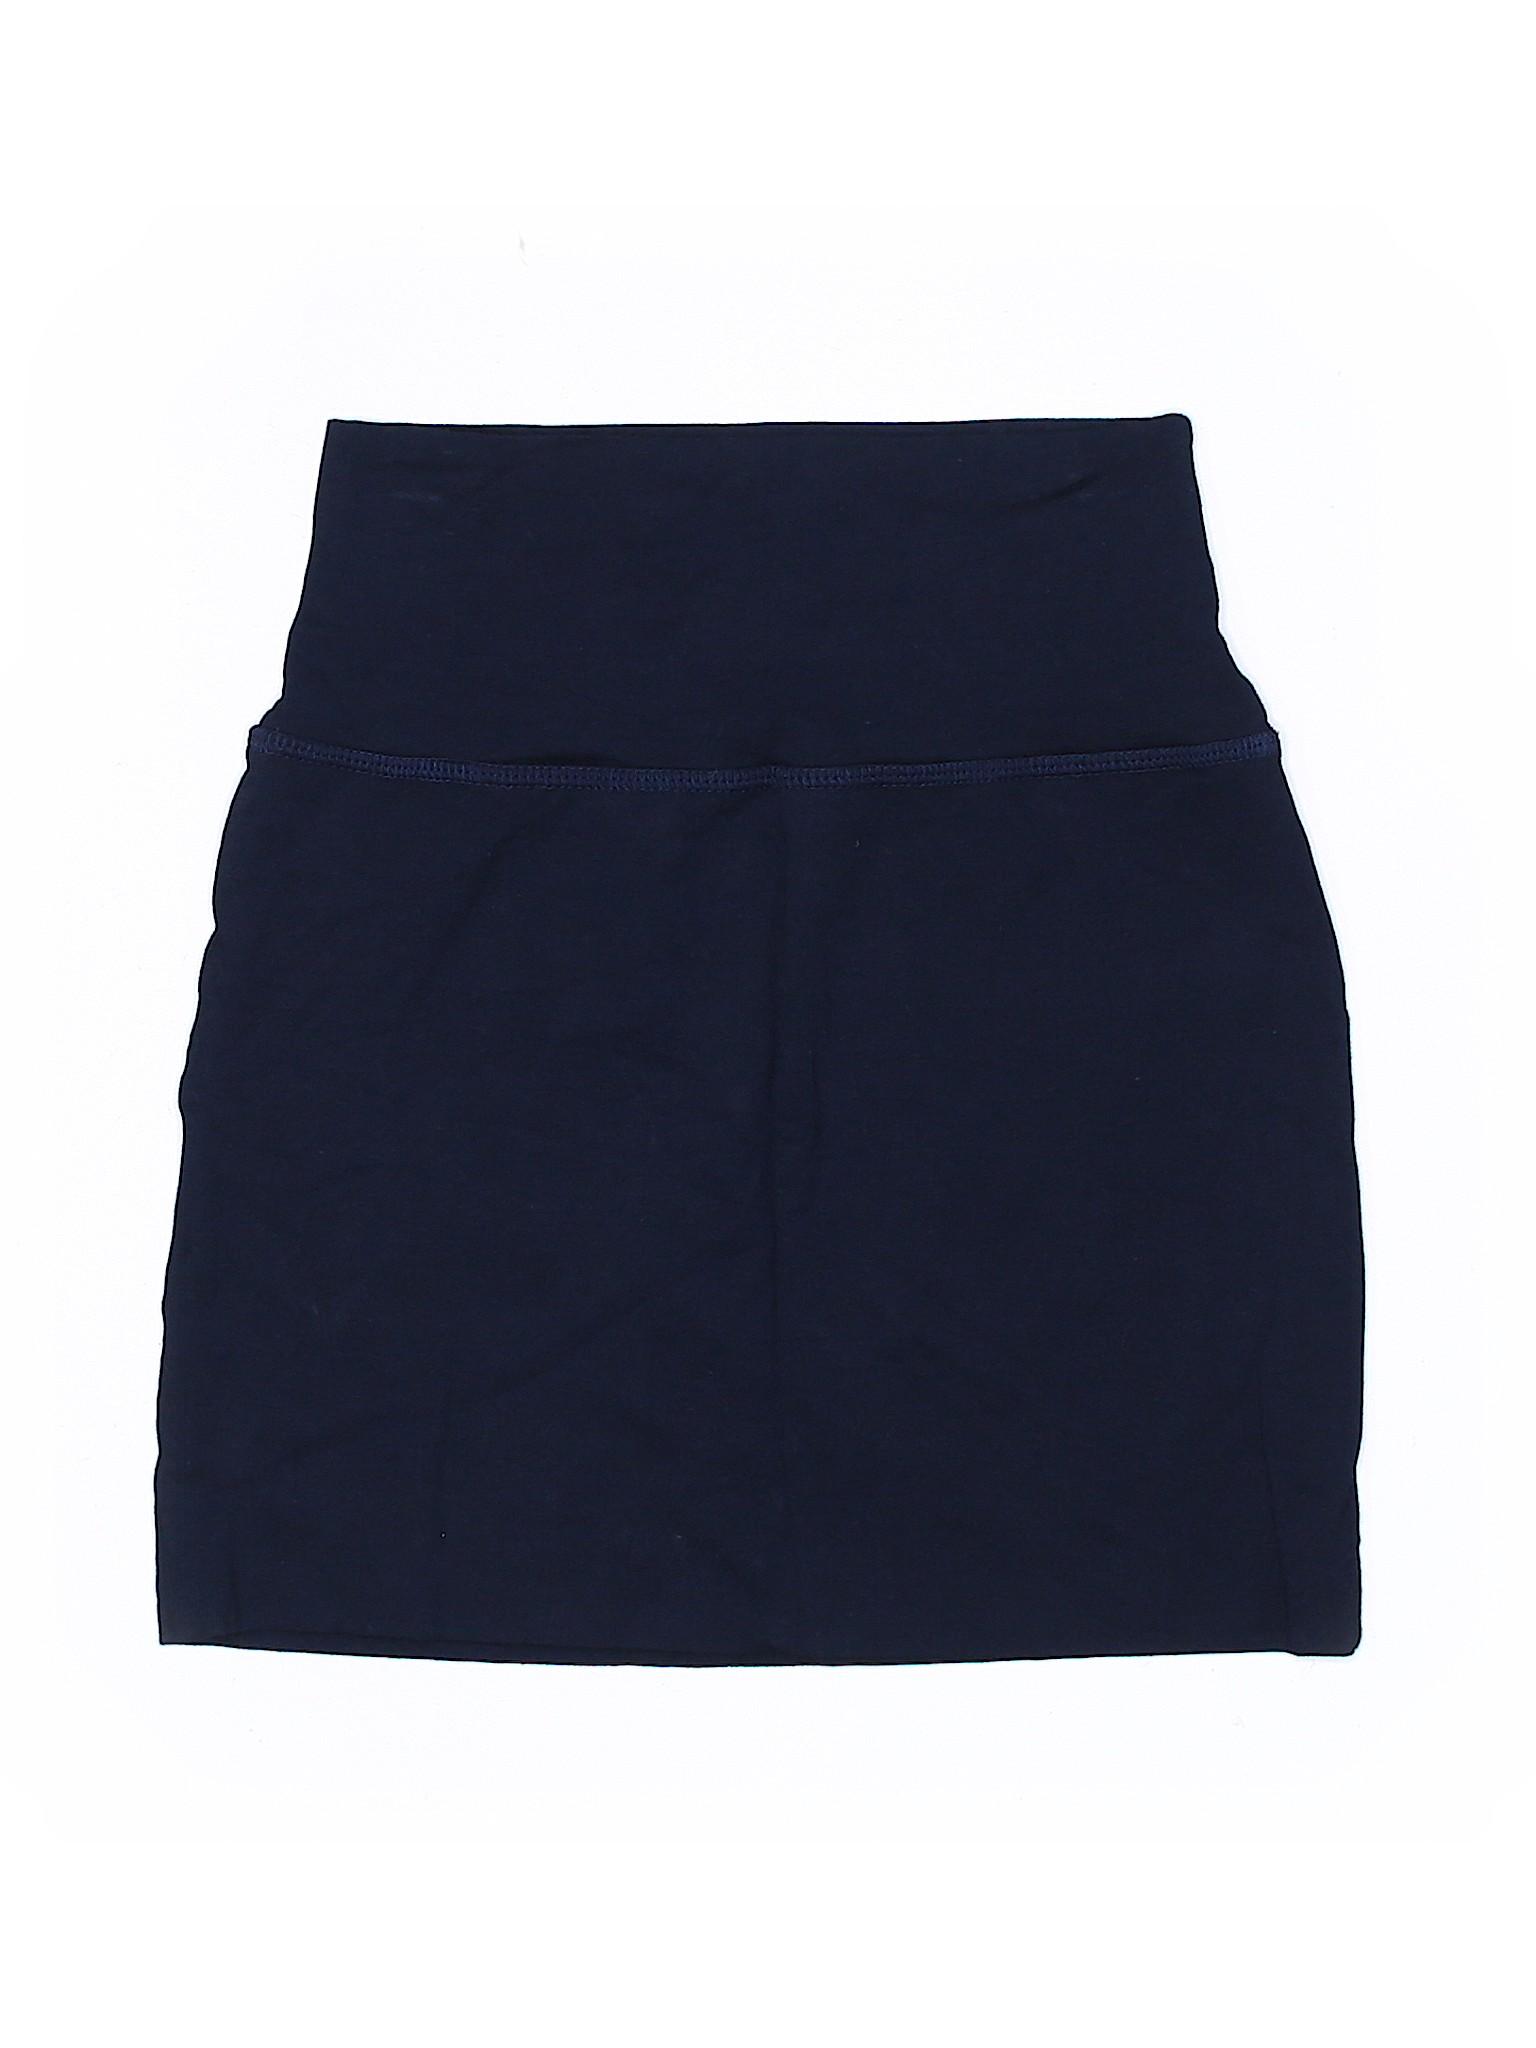 Boutique Casual Skirt Skirt Boutique Casual taqEwnX6